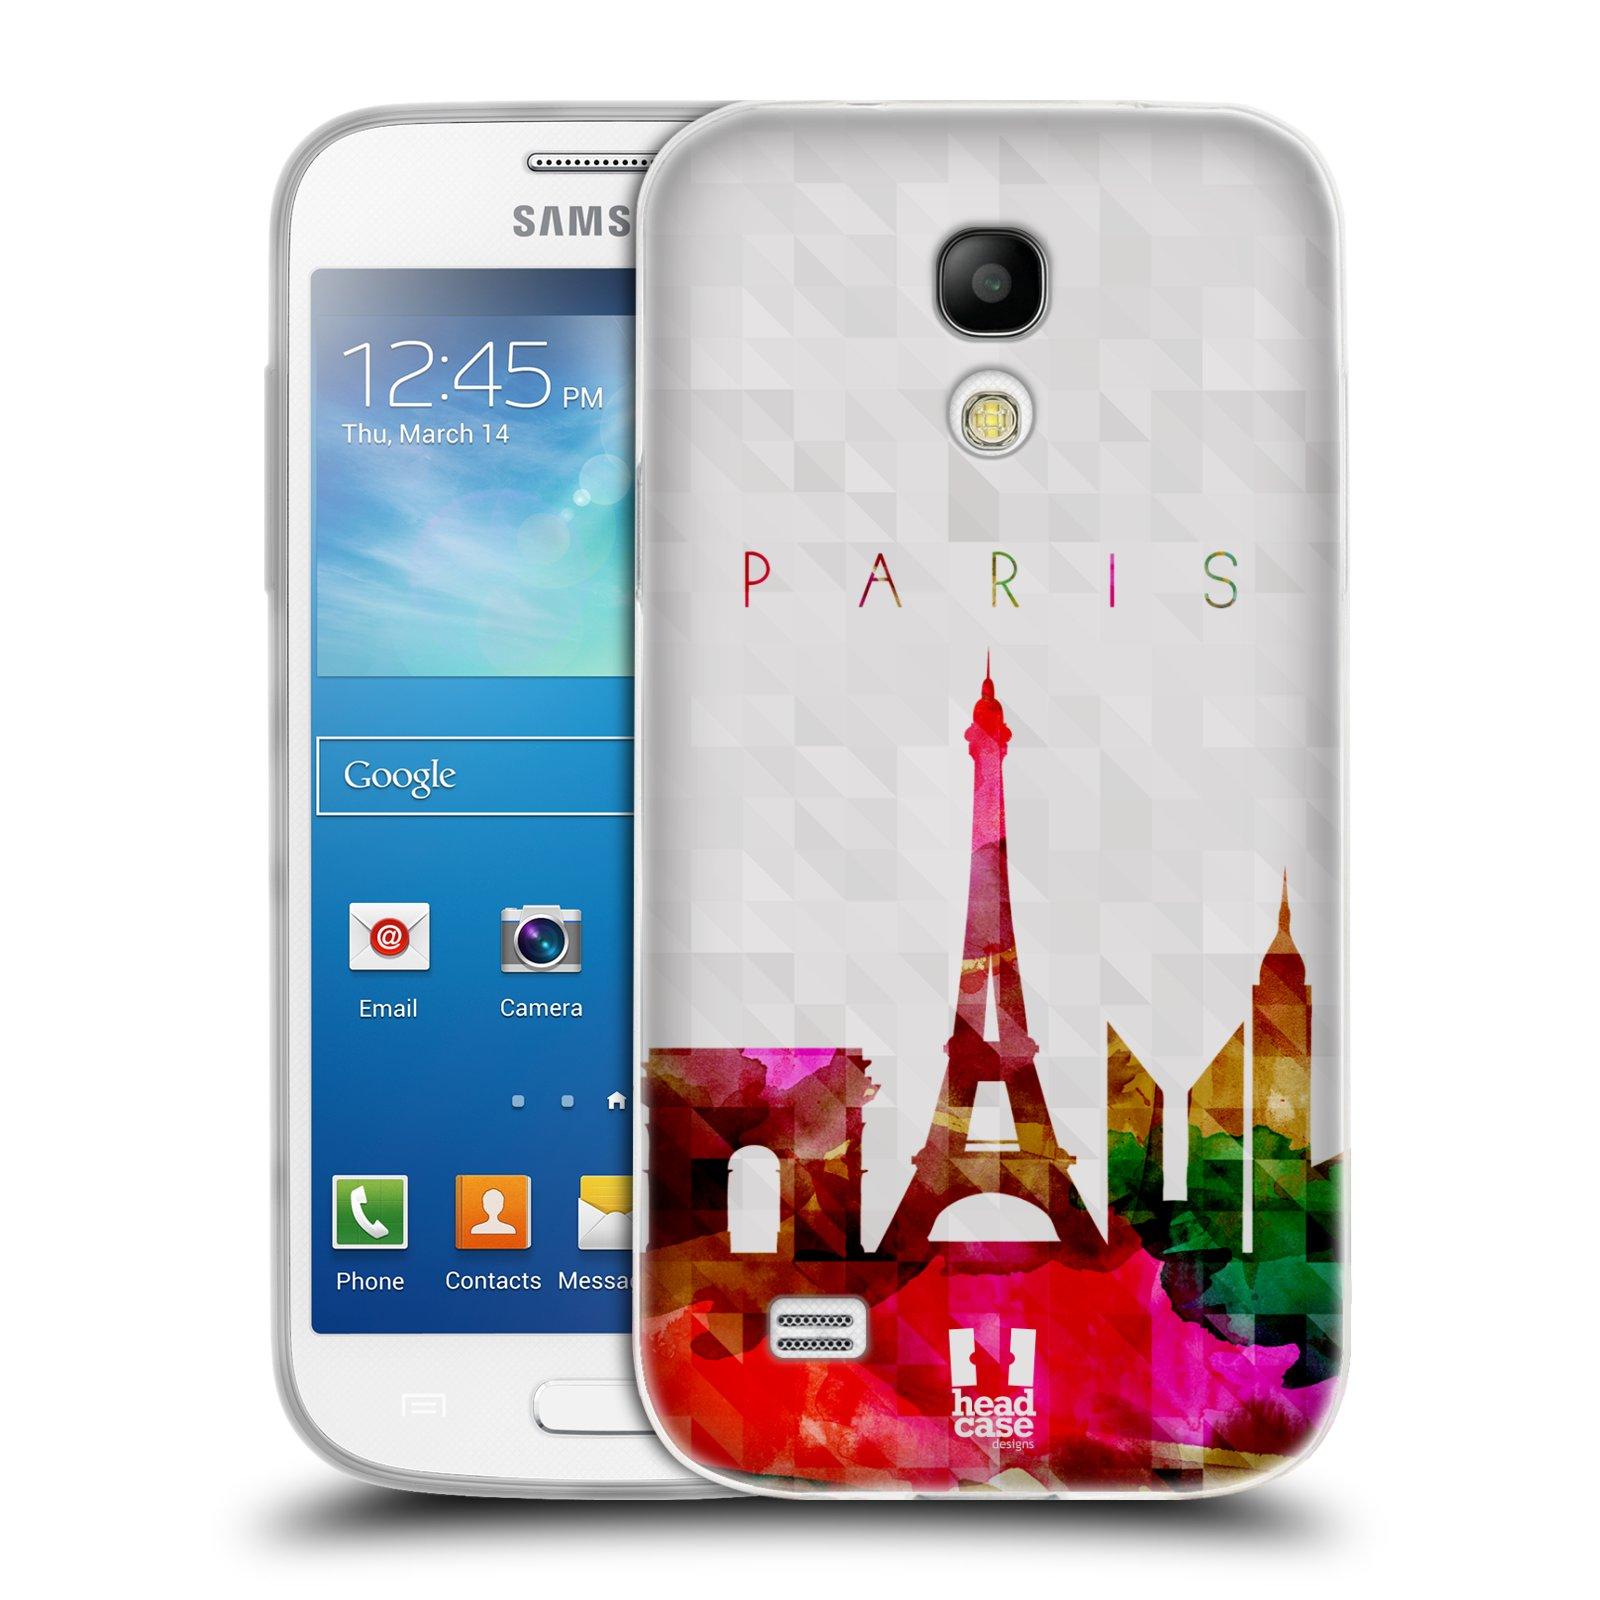 HEAD CASE silikonový obal na mobil Samsung Galaxy S4 MINI vzor Vodní barva města silueta PAŘÍŽ FRANICE EIFFELOVA VĚŽ